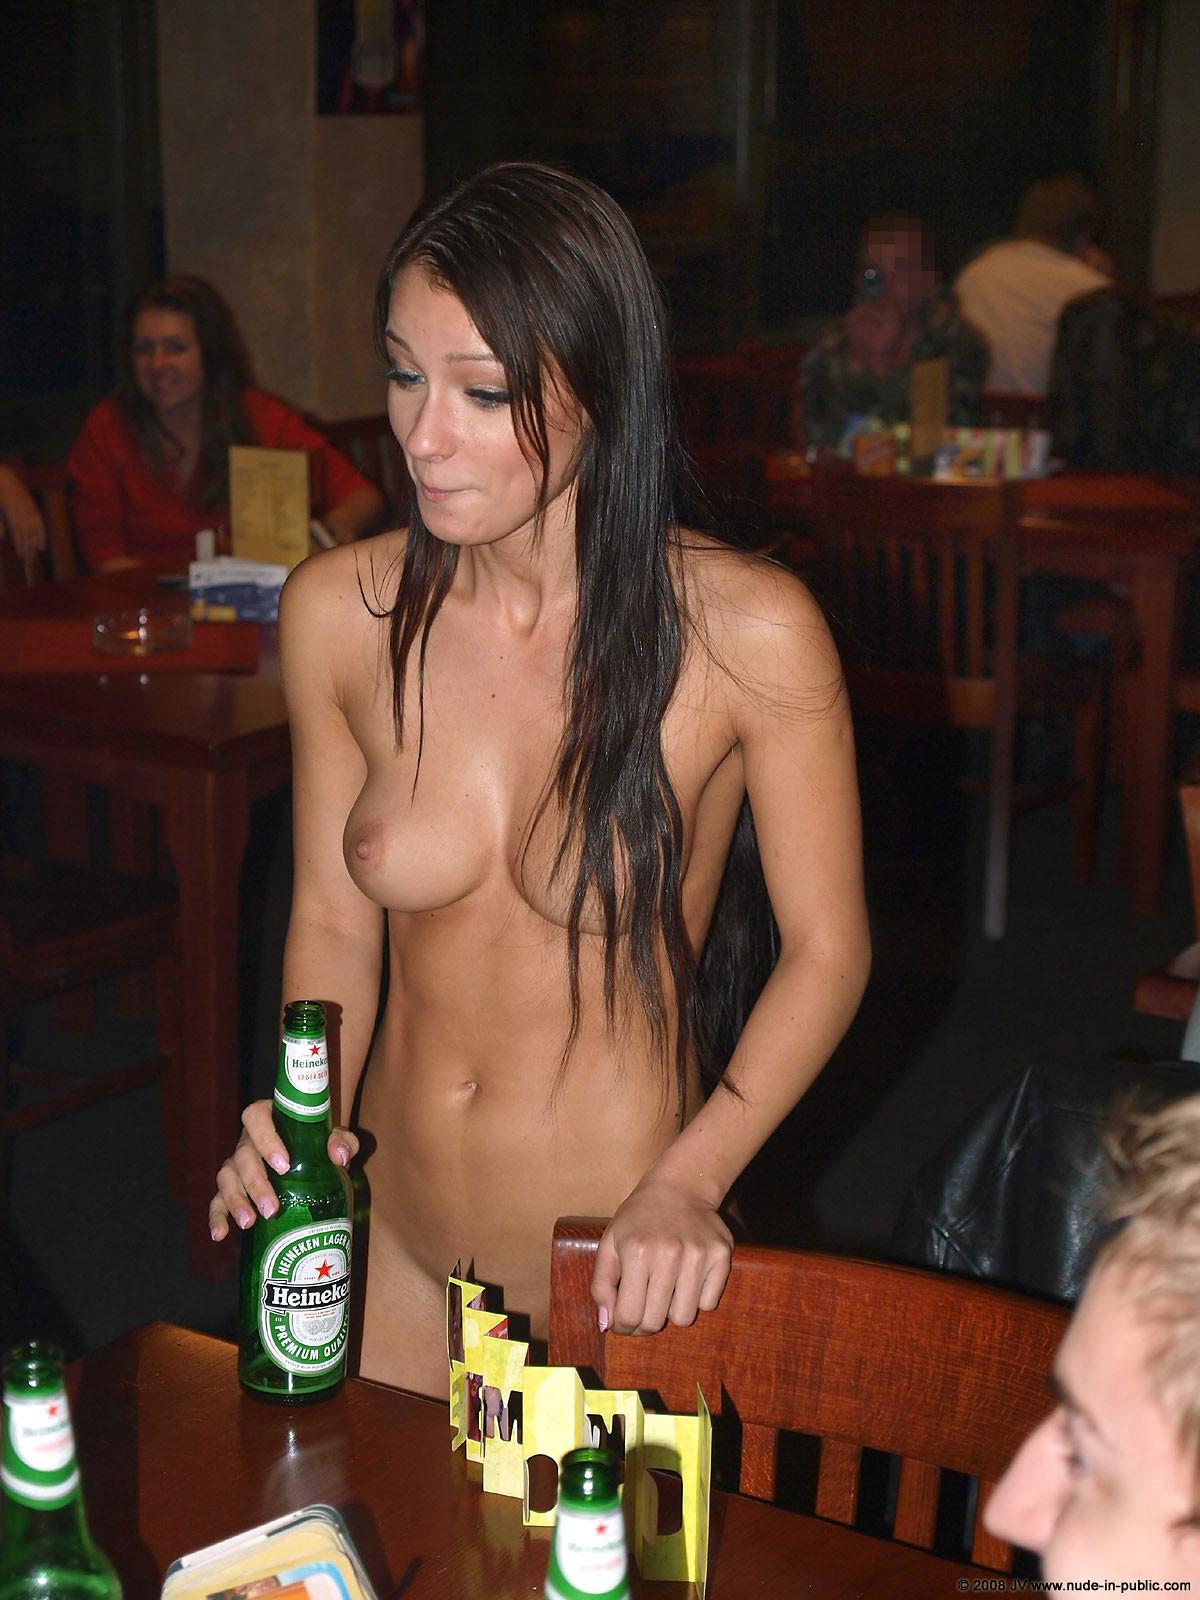 Nude in public beers, big ass shakin pics